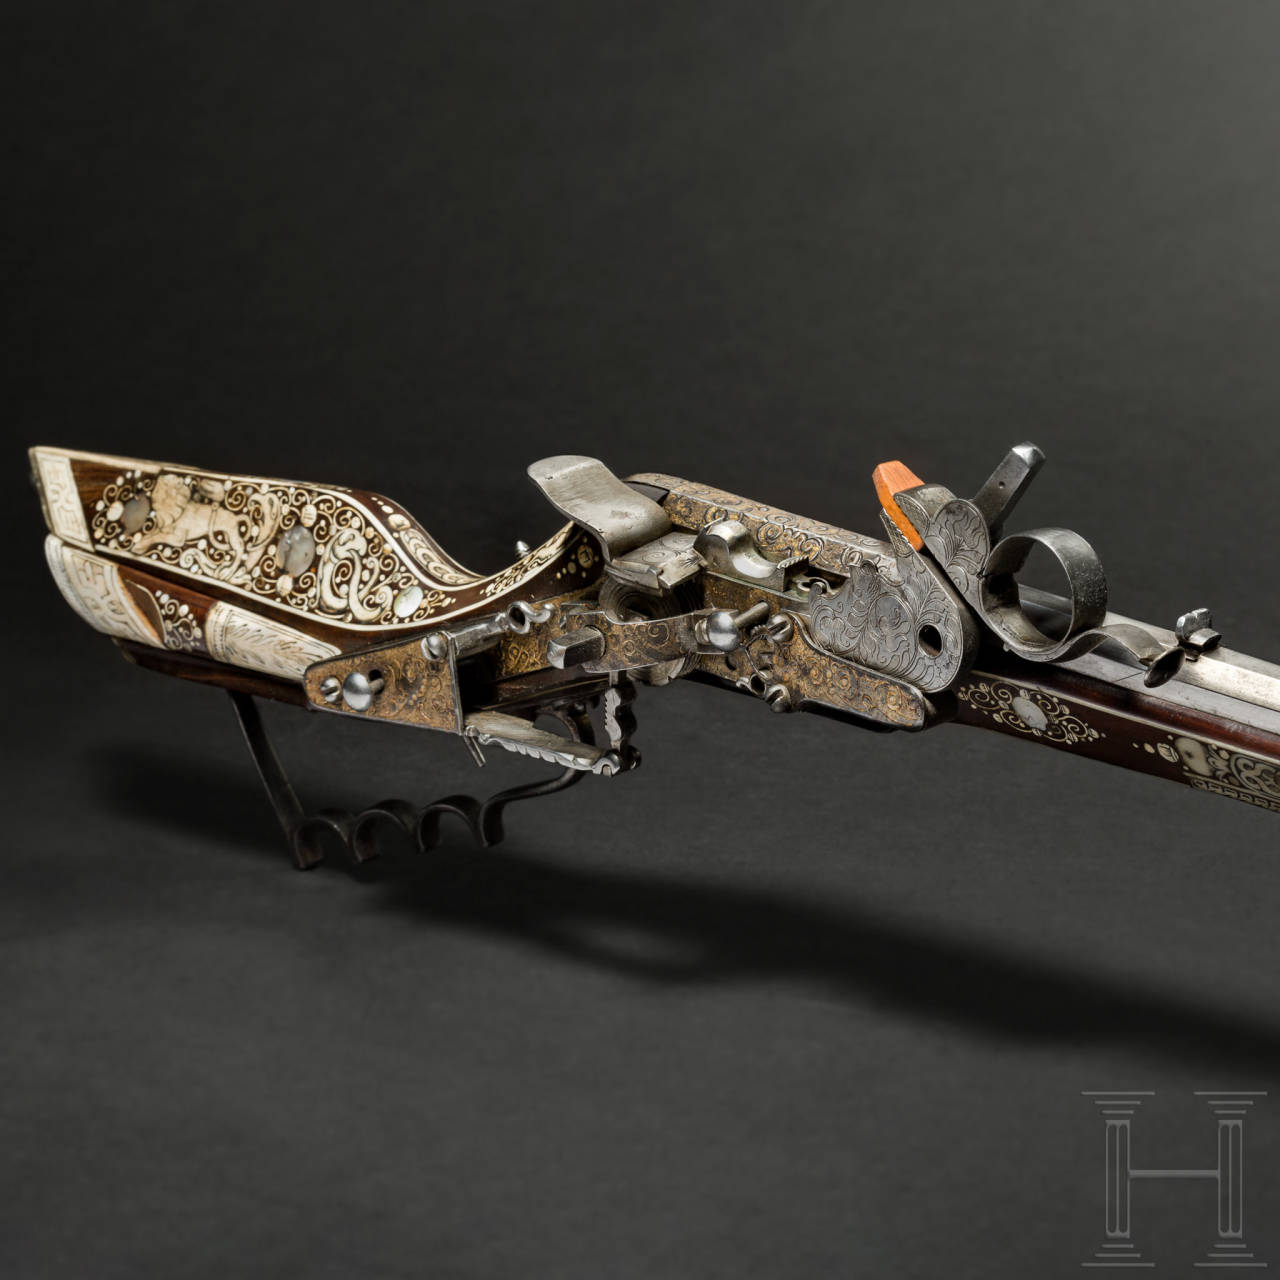 A gilt deluxe birding rifle (Teschinke) with rich bone inlays, Cieszyn, circa 1650